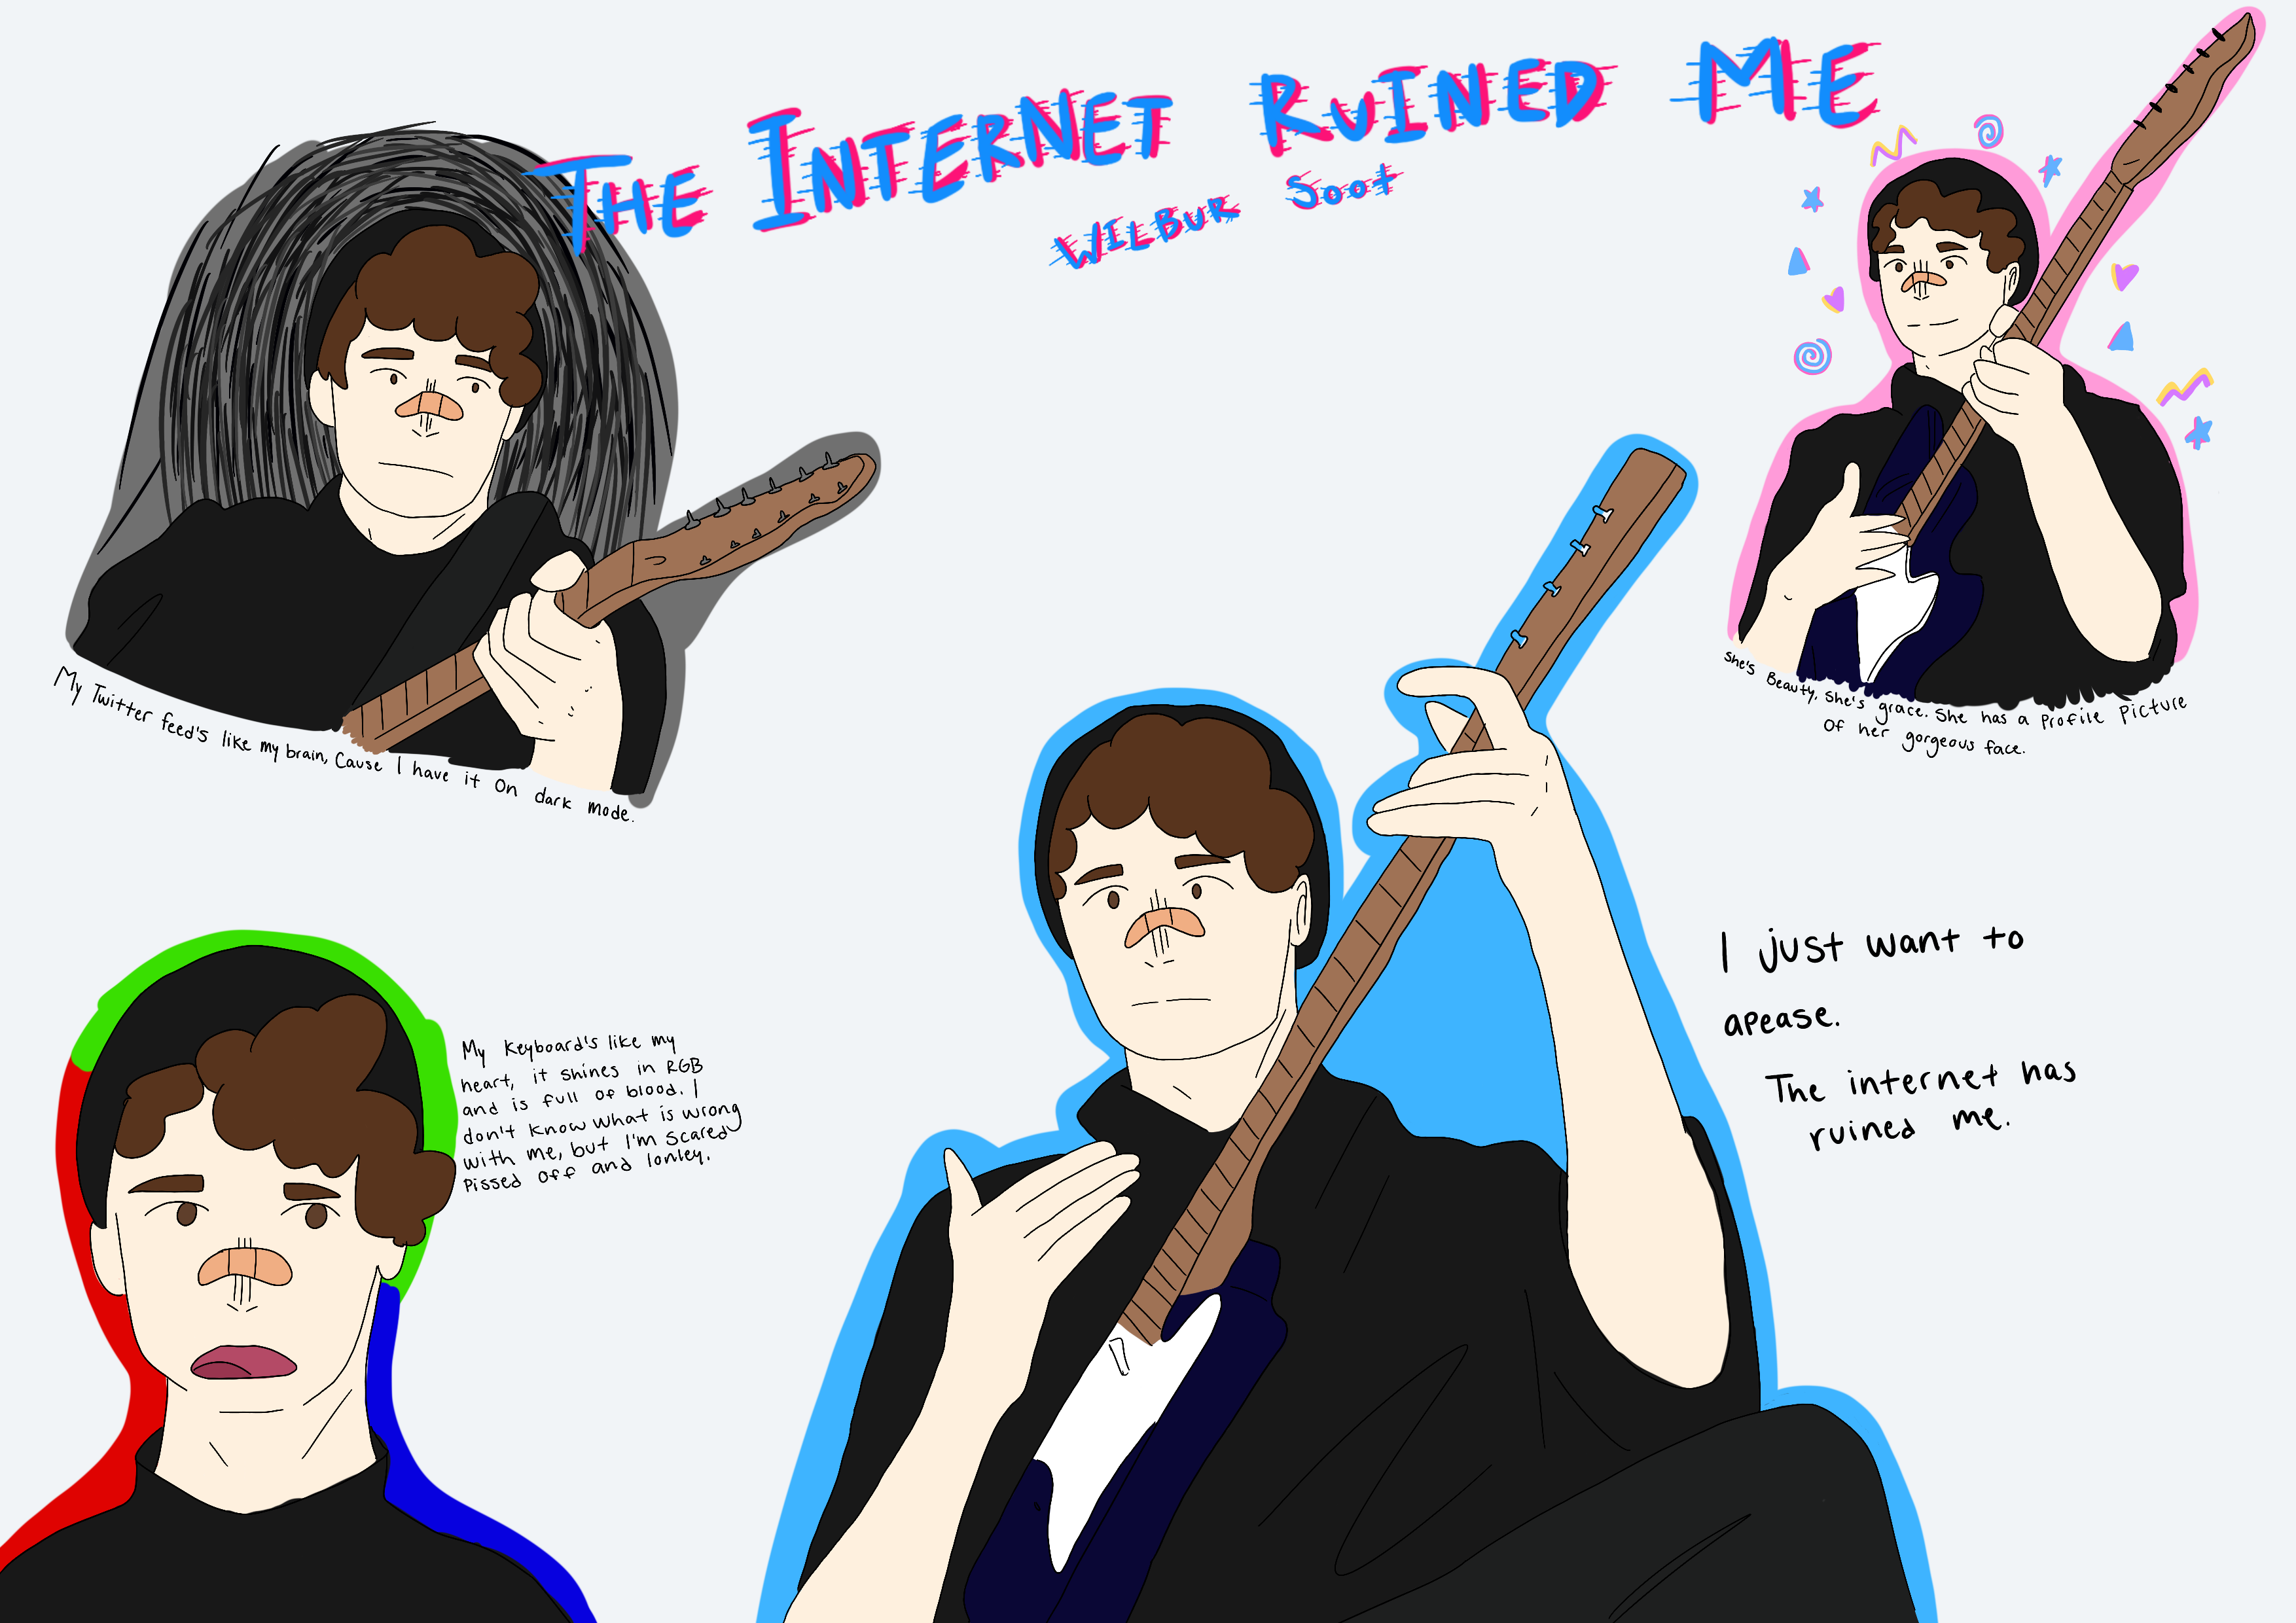 The internet ruined me - Wilbur Soot